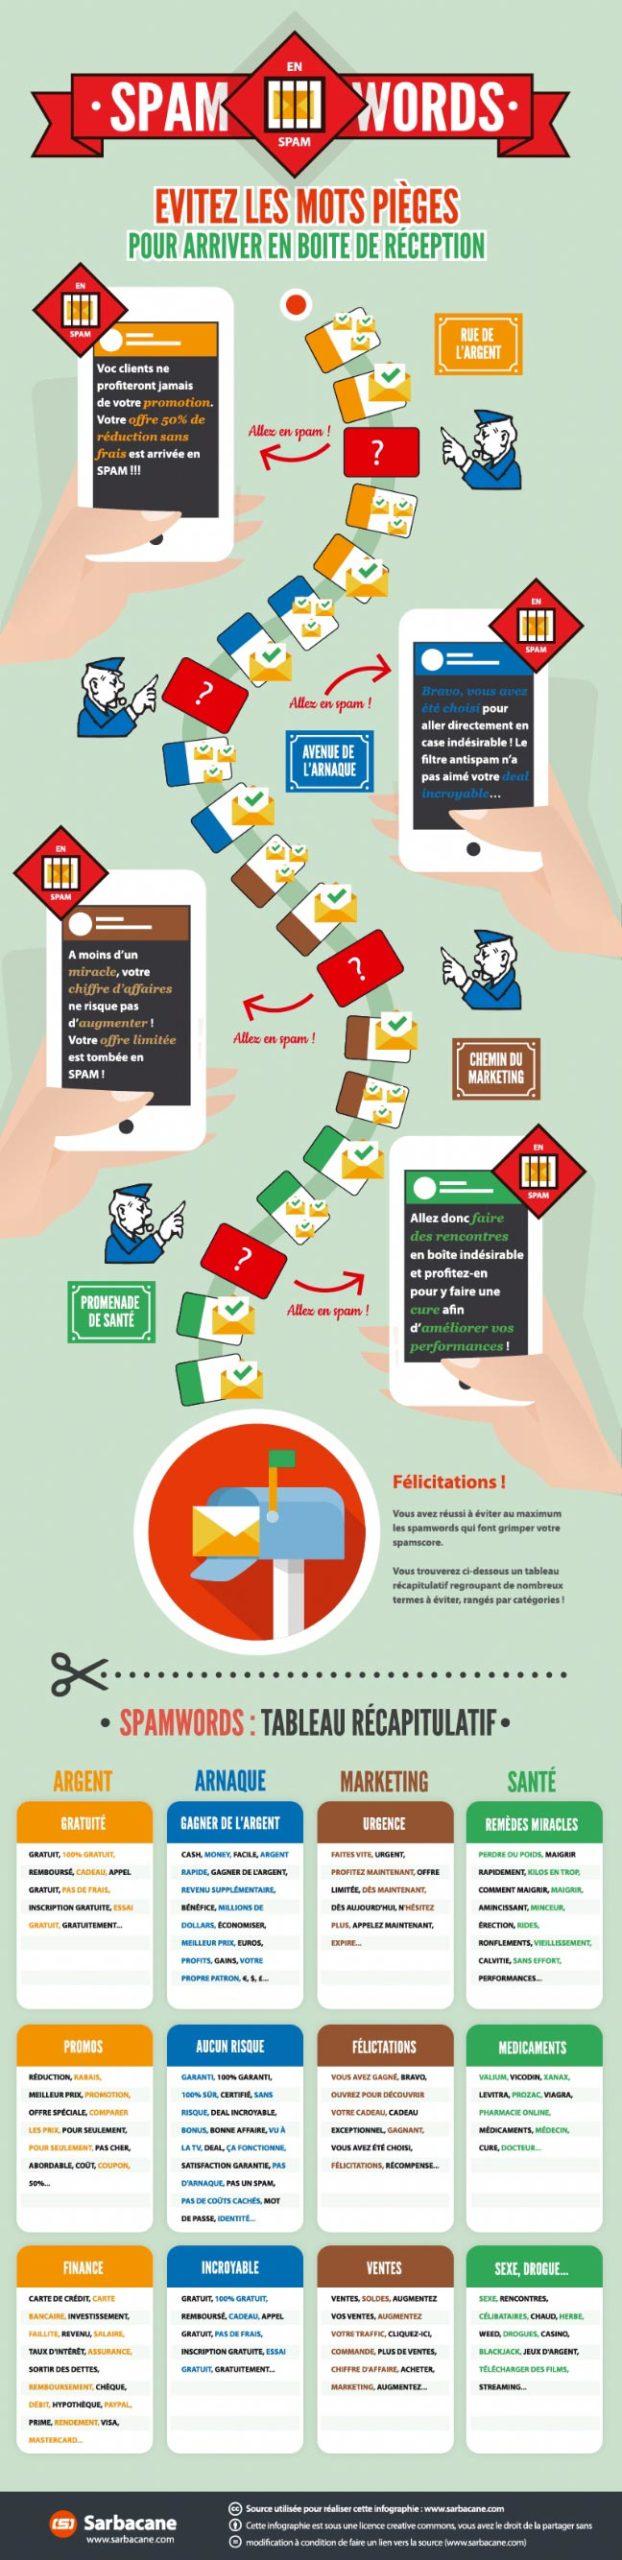 infographie-spamwords-newsletter